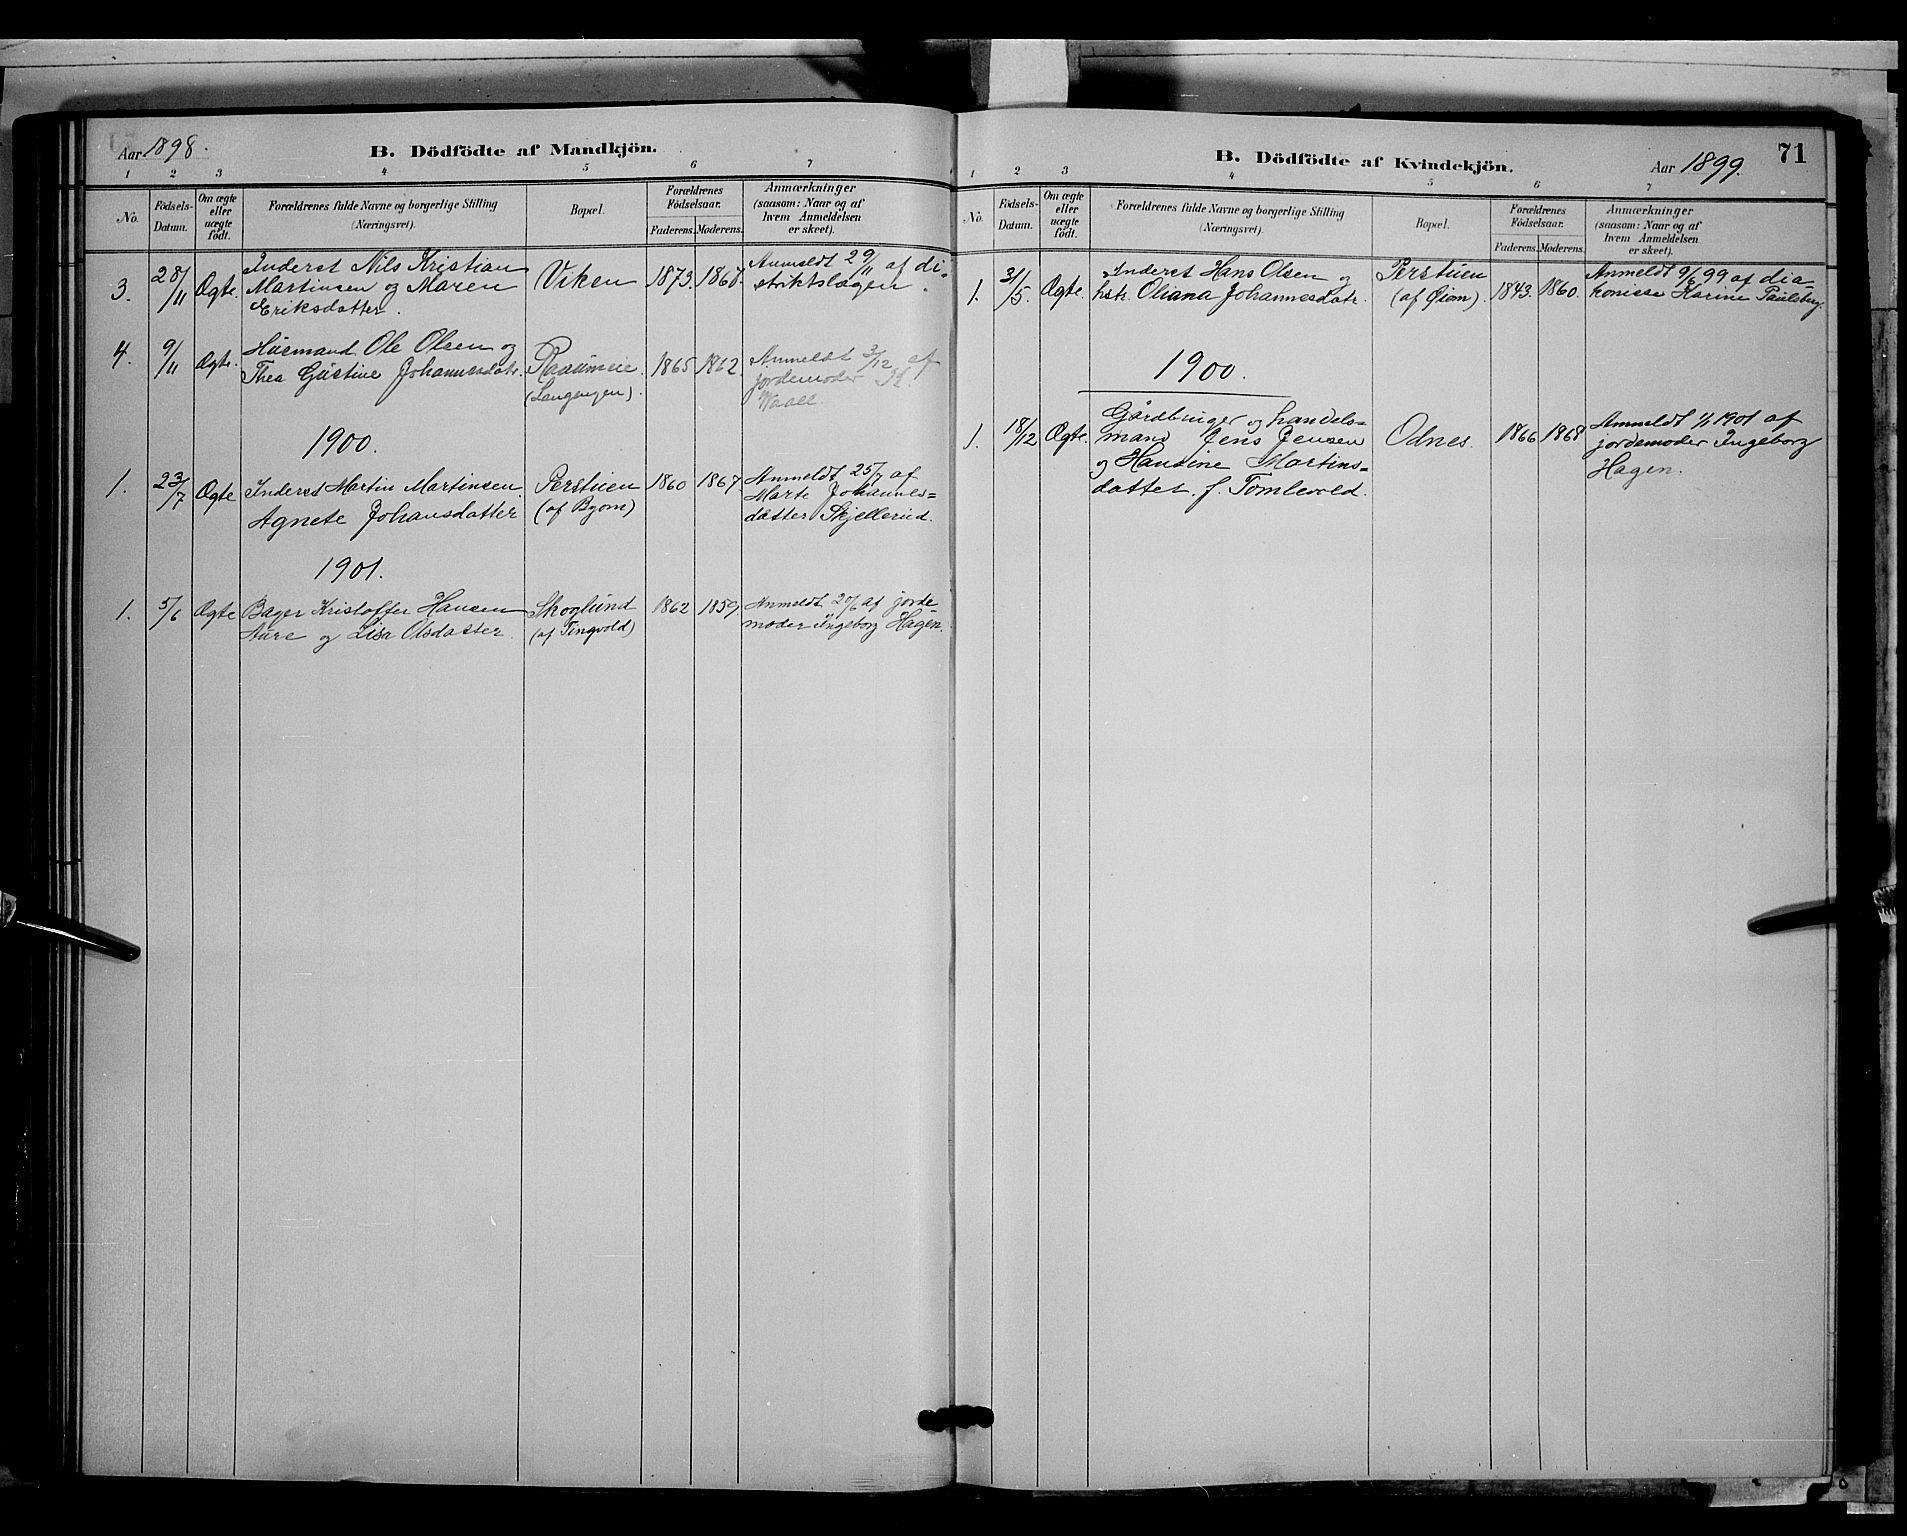 SAH, Søndre Land prestekontor, L/L0003: Klokkerbok nr. 3, 1884-1902, s. 71